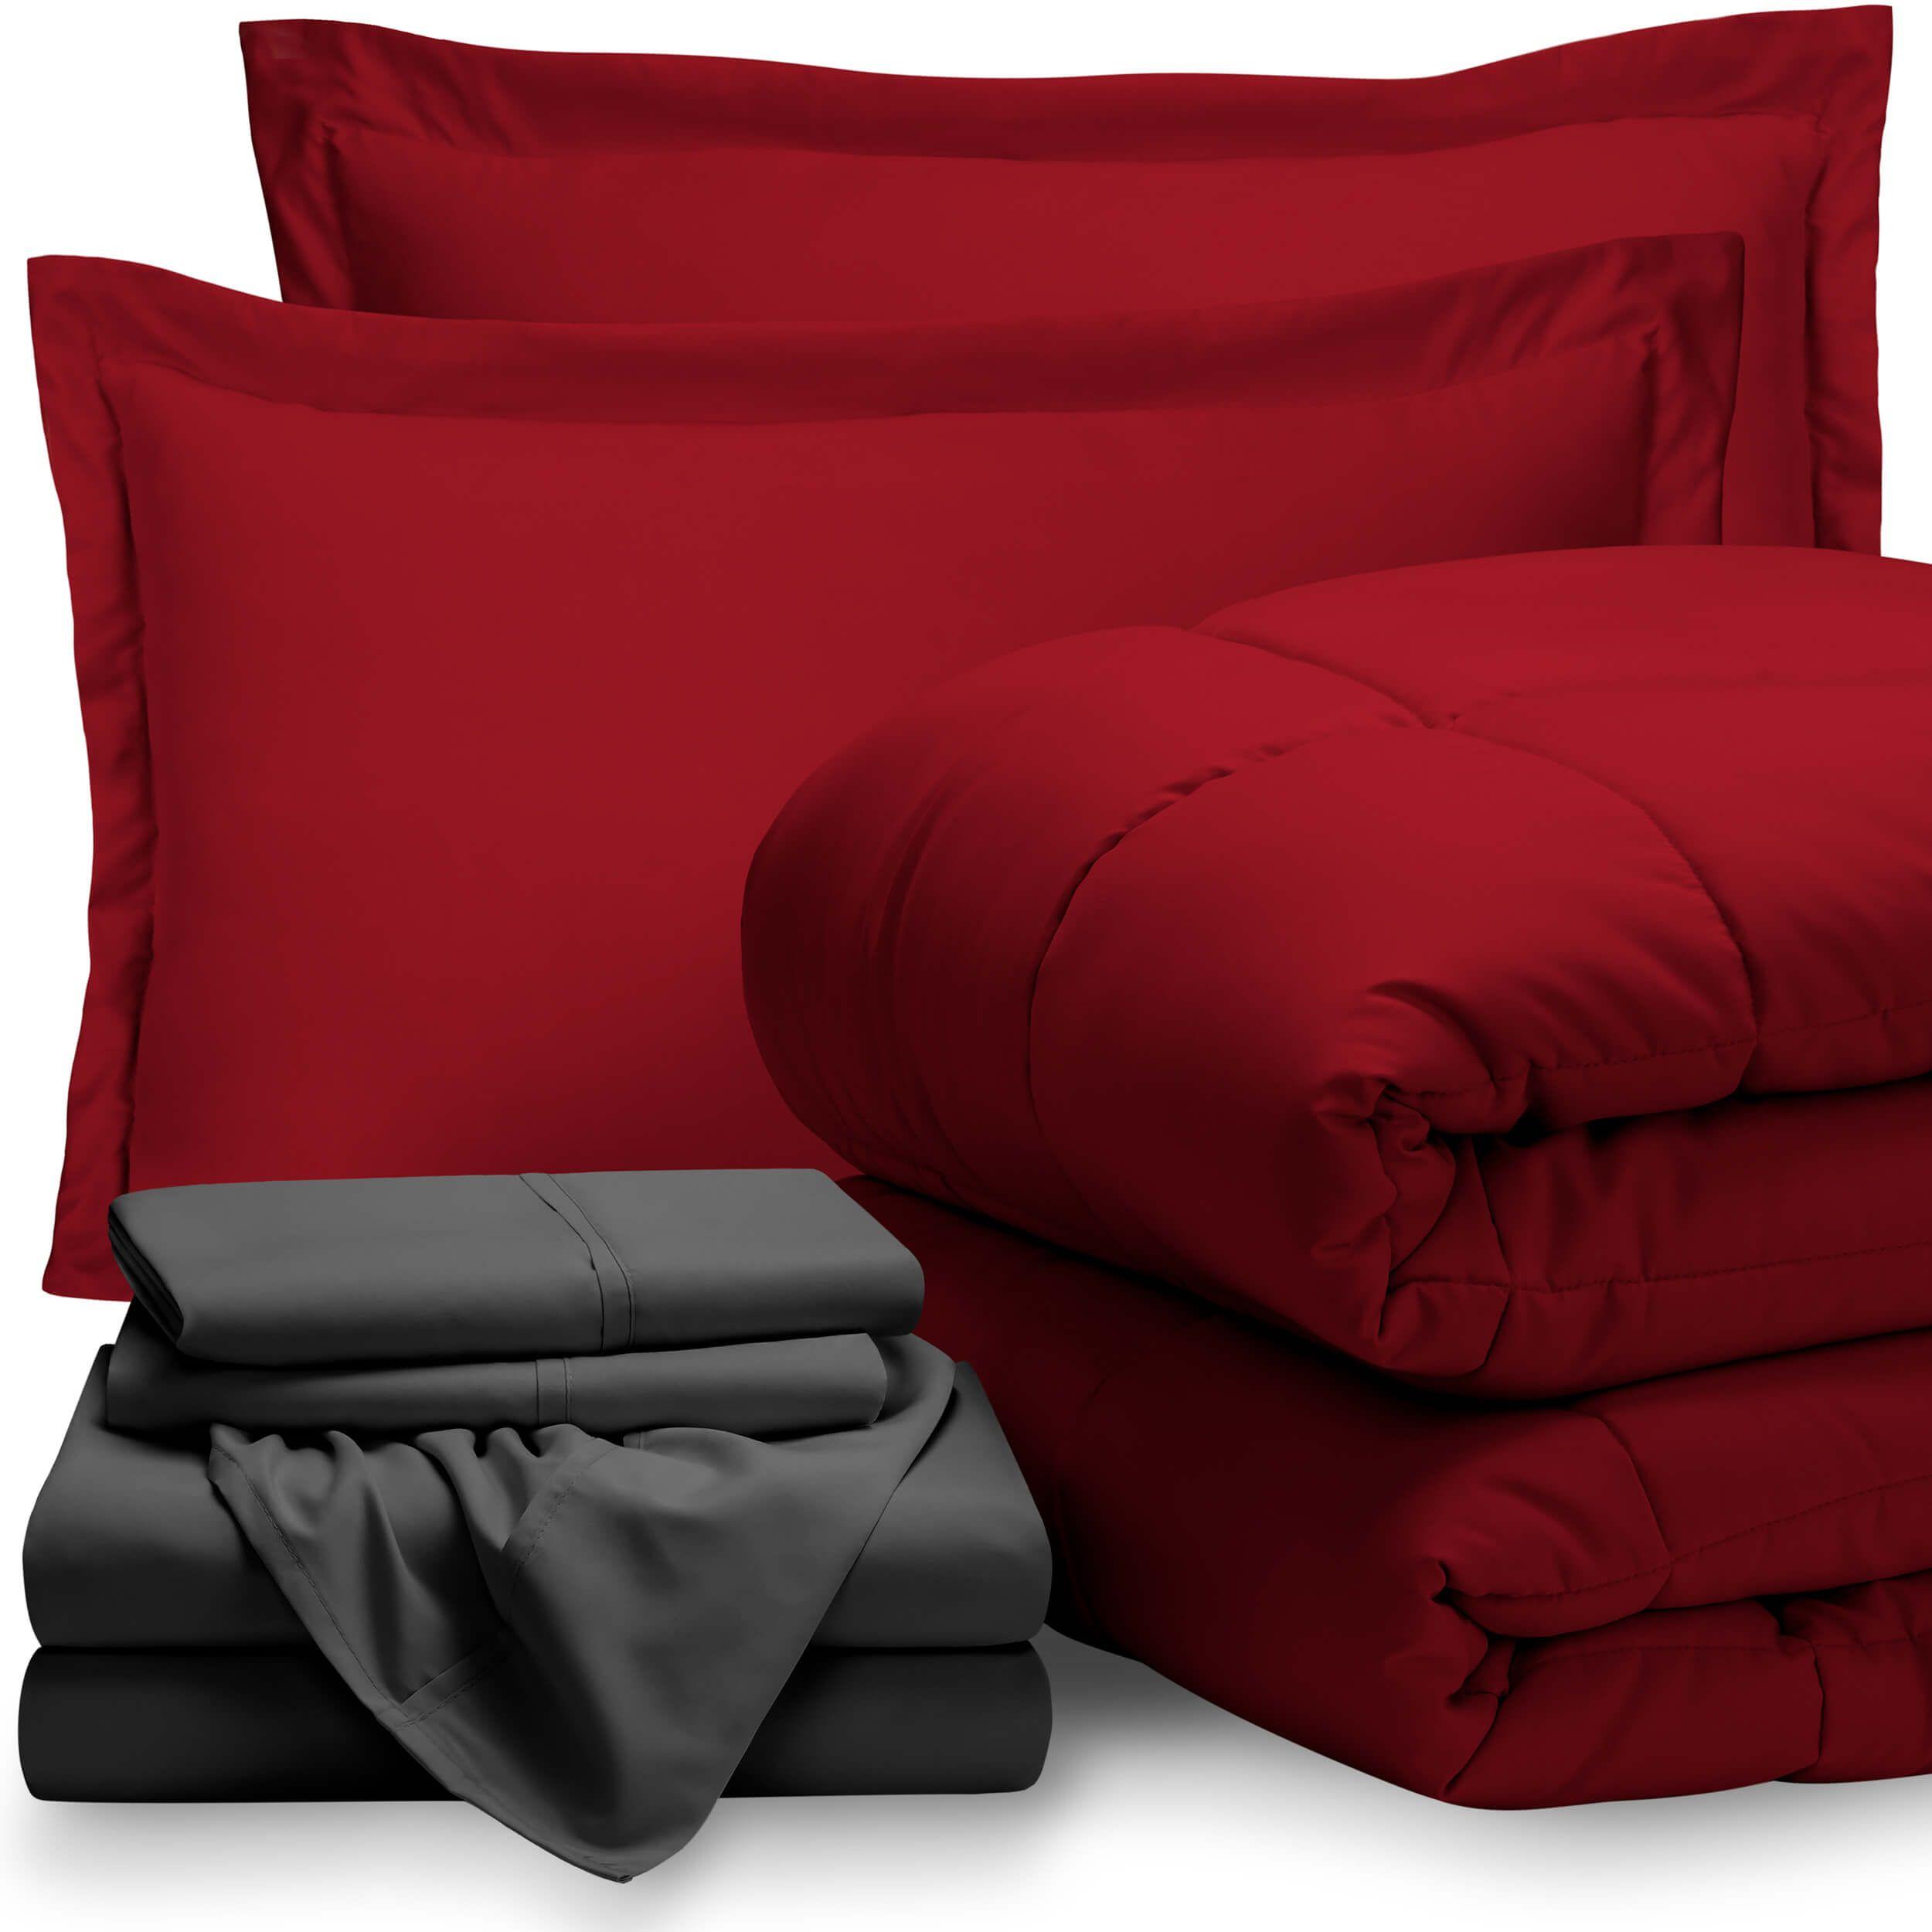 Bedding Sets, Bedding Ideas